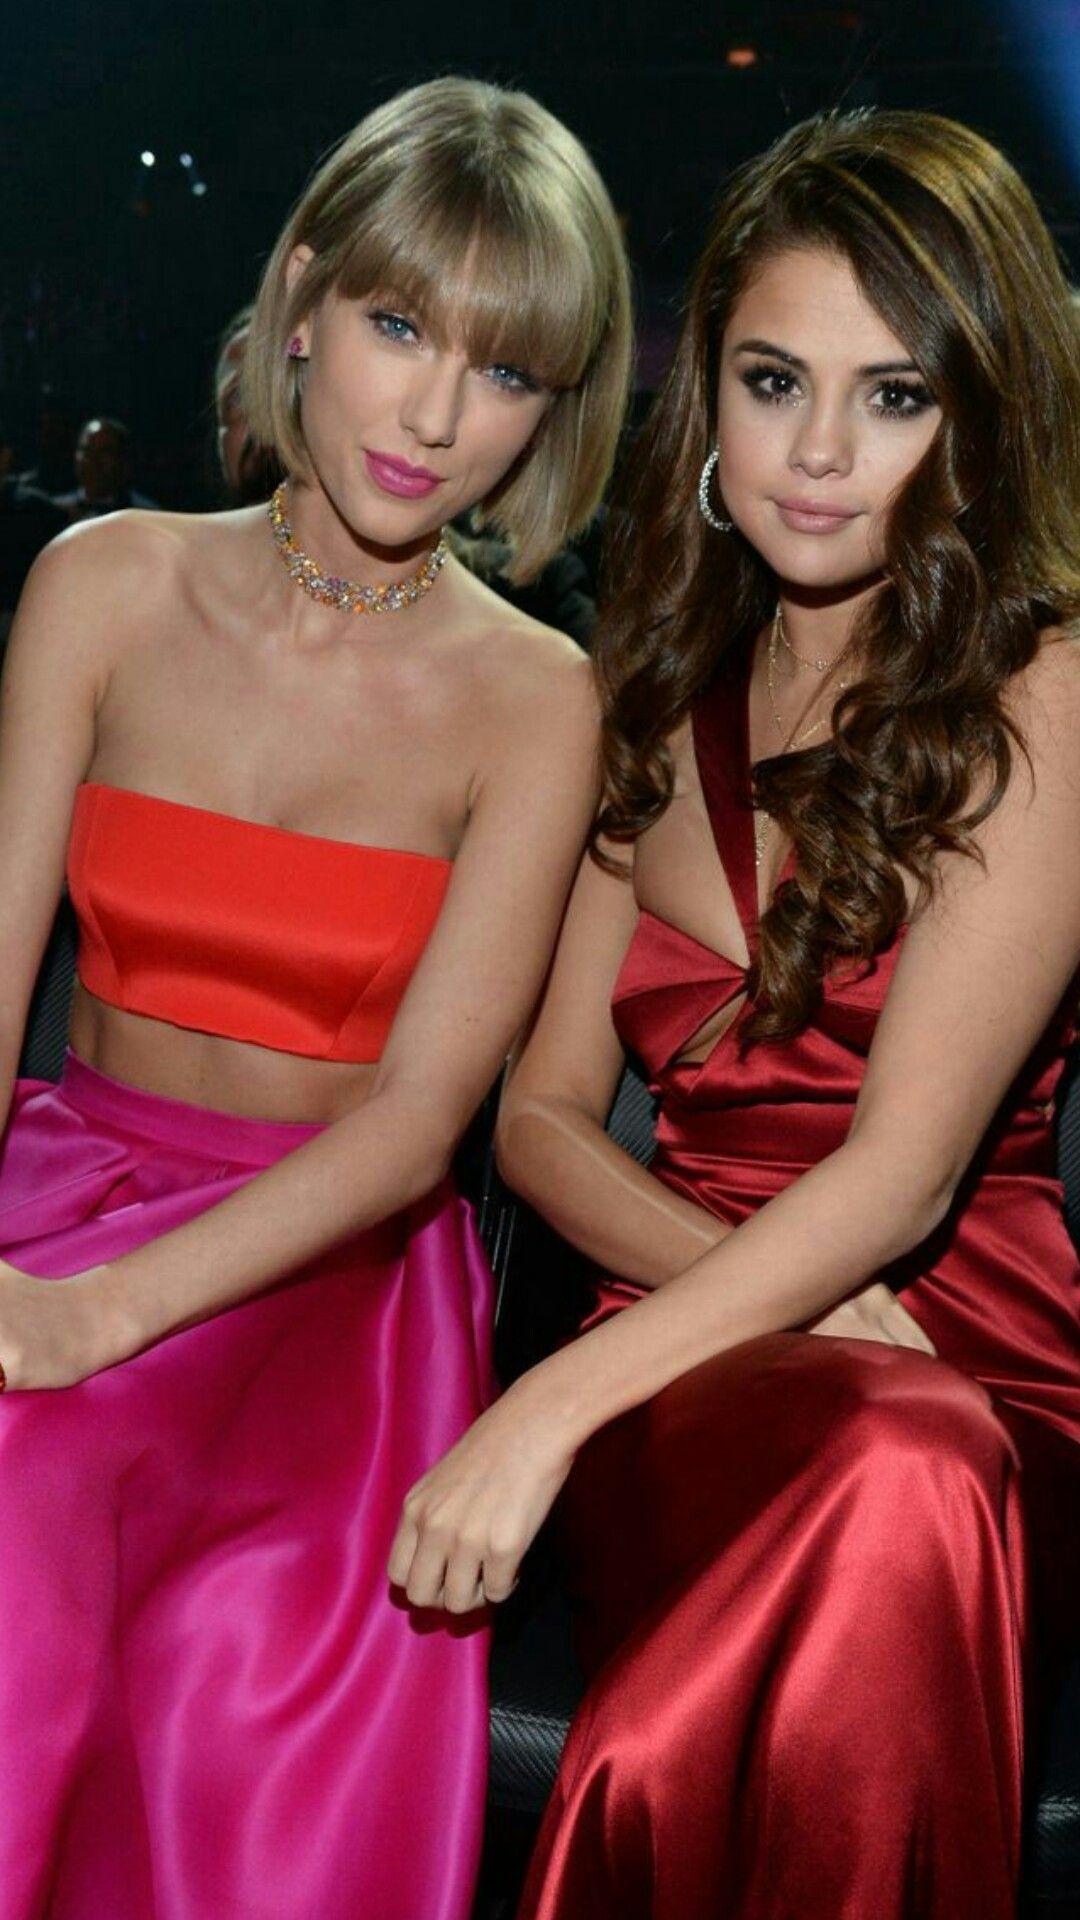 Taylor Swift Selena Gomez Taylor Swift Hot Selena Gomez Hair Taylor Swift